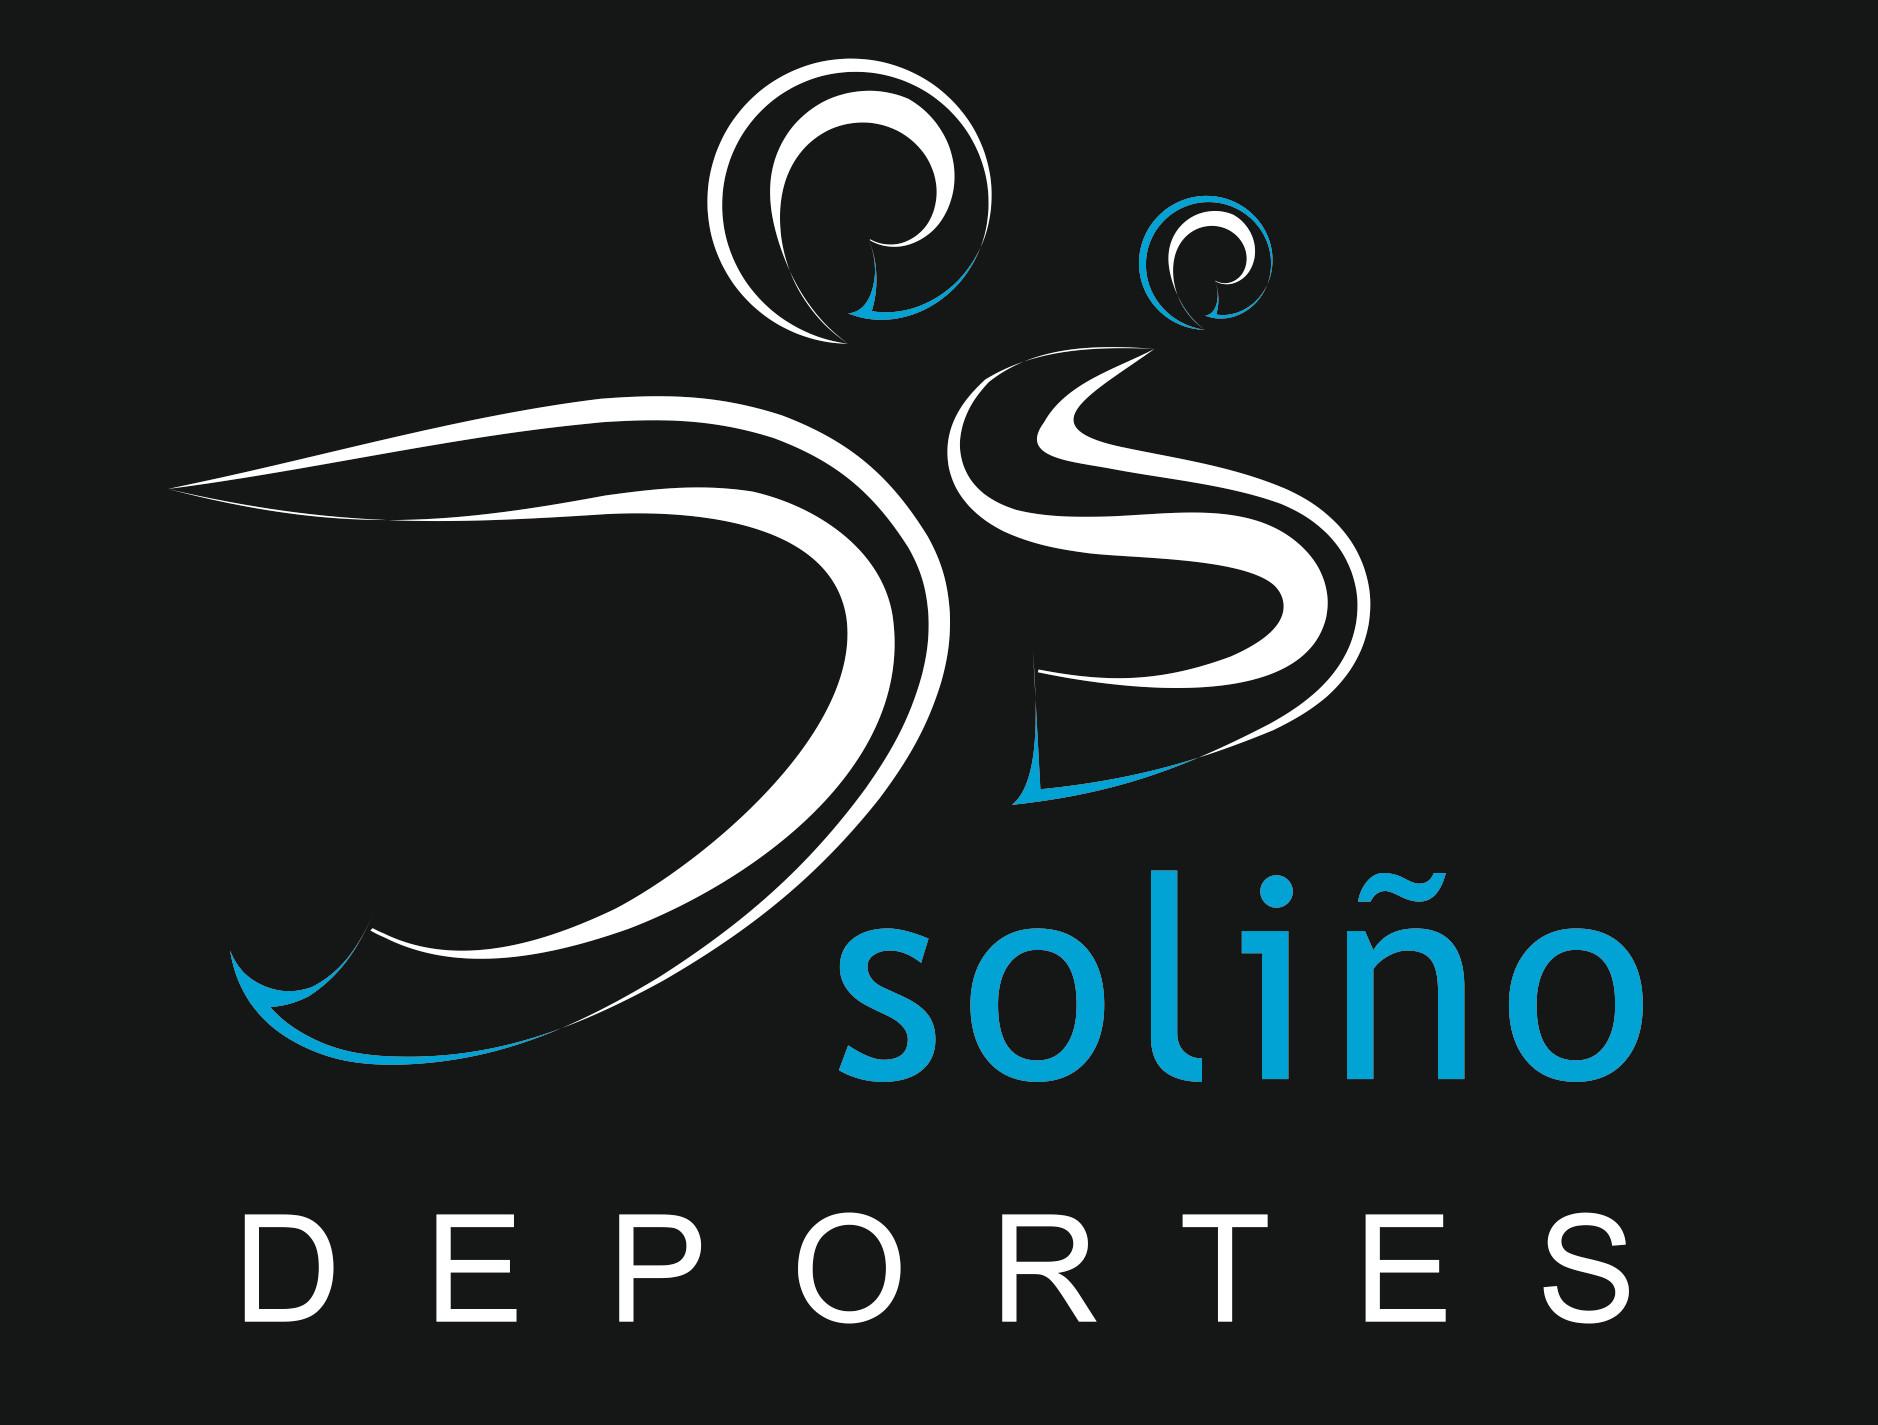 Logotipo Deportes Soliño